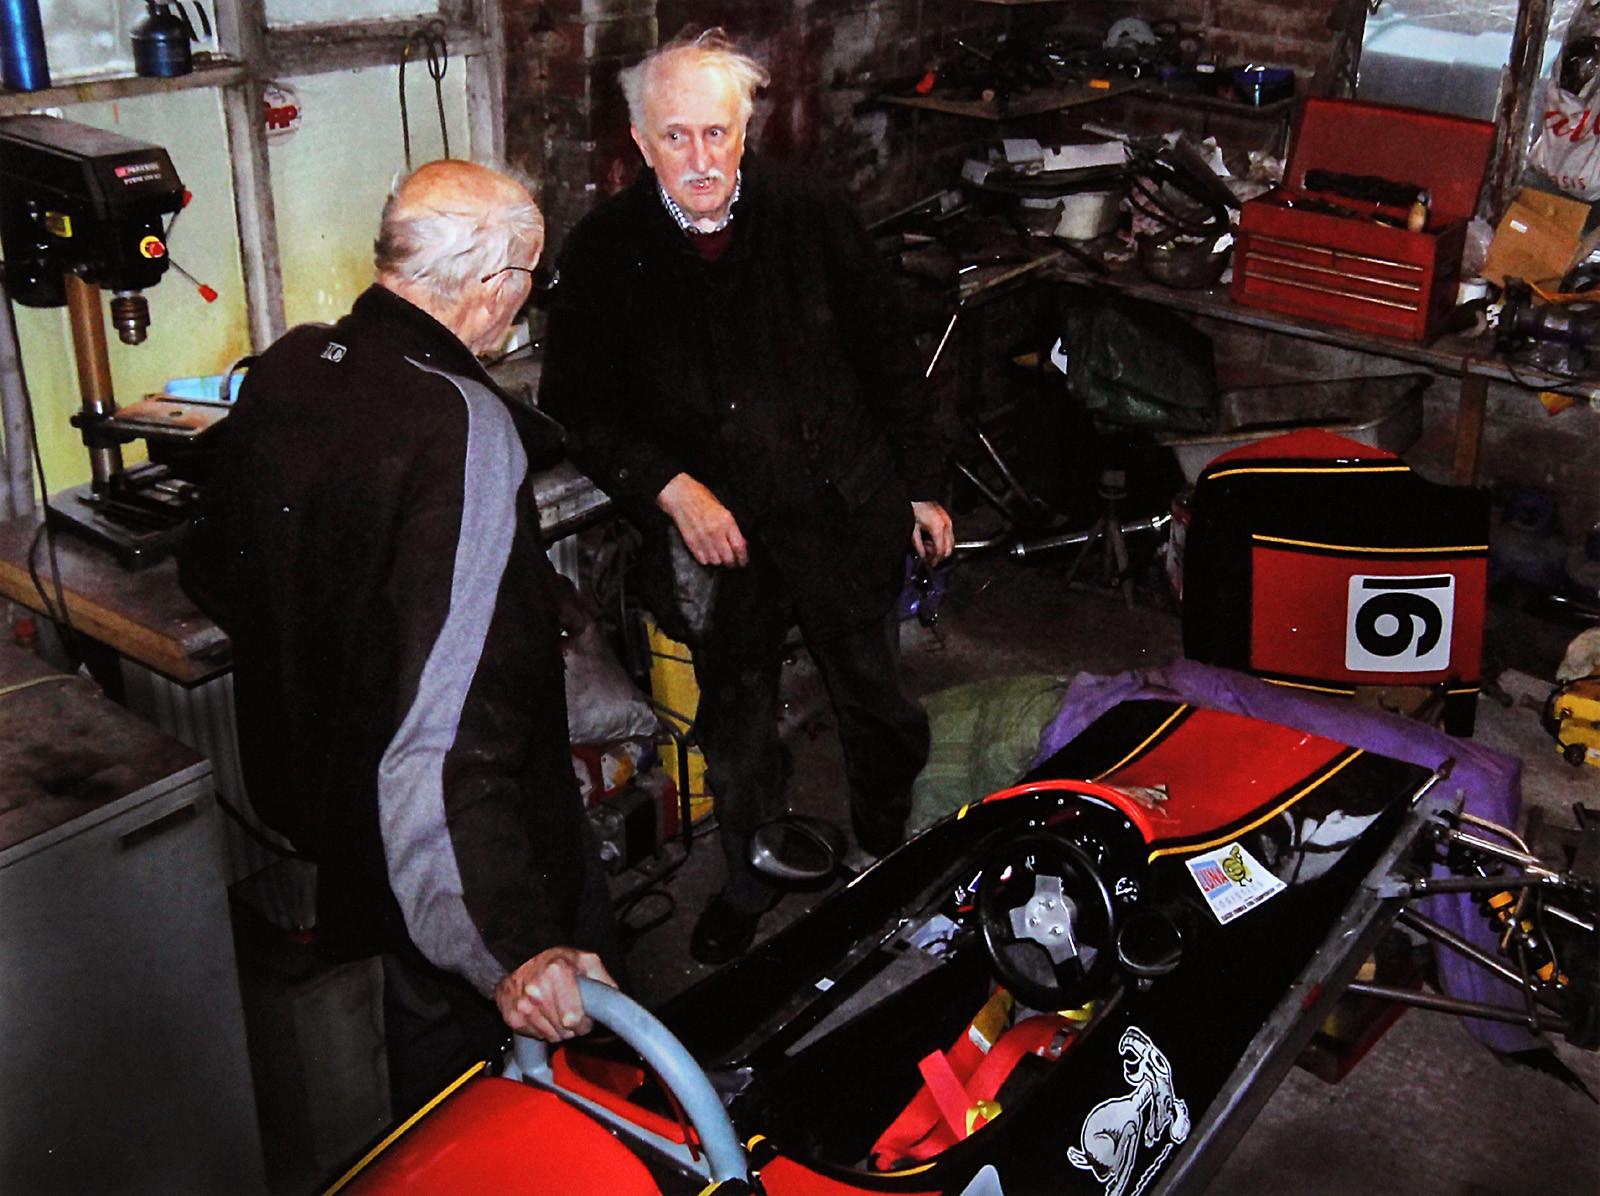 COLOUR - Willy Moor's Garage by Lawson Piggott (8 marks)